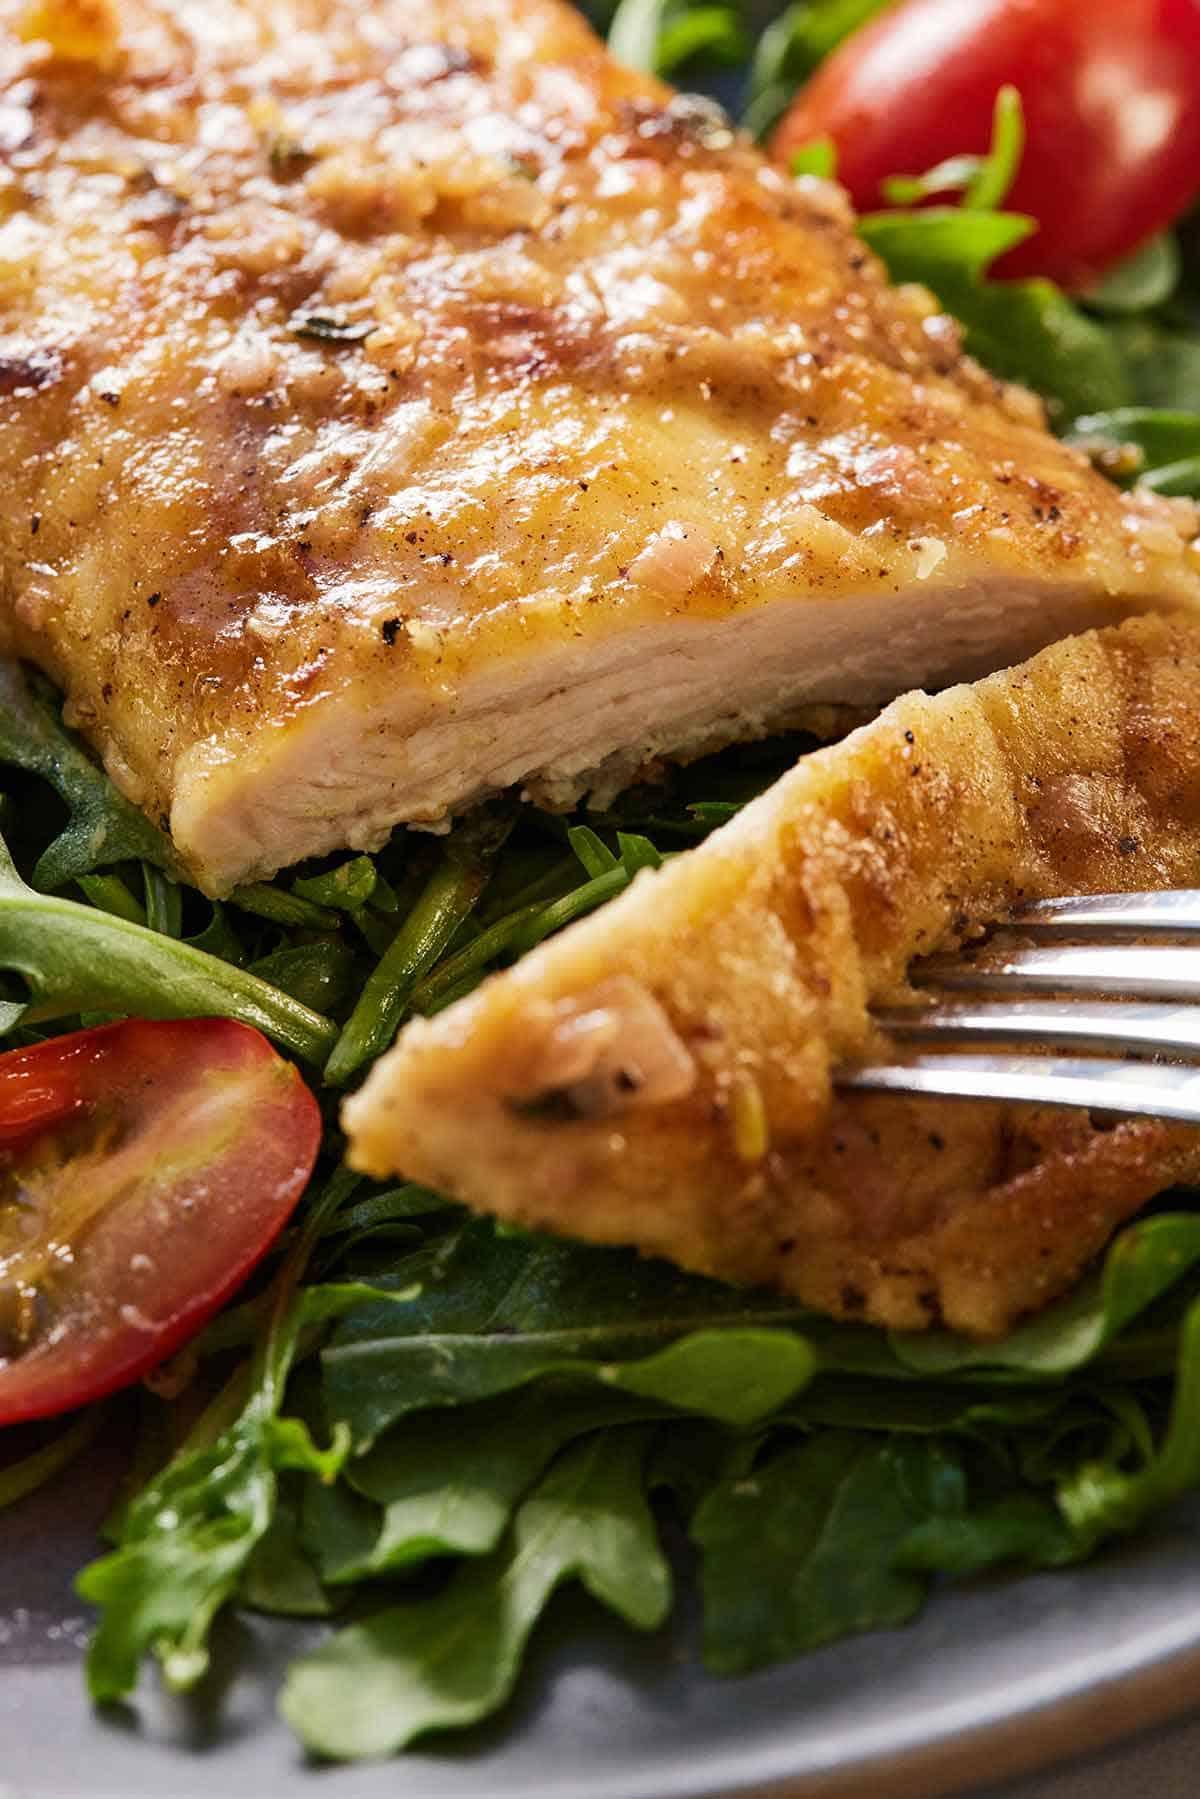 Chicken paillard sliced opened.